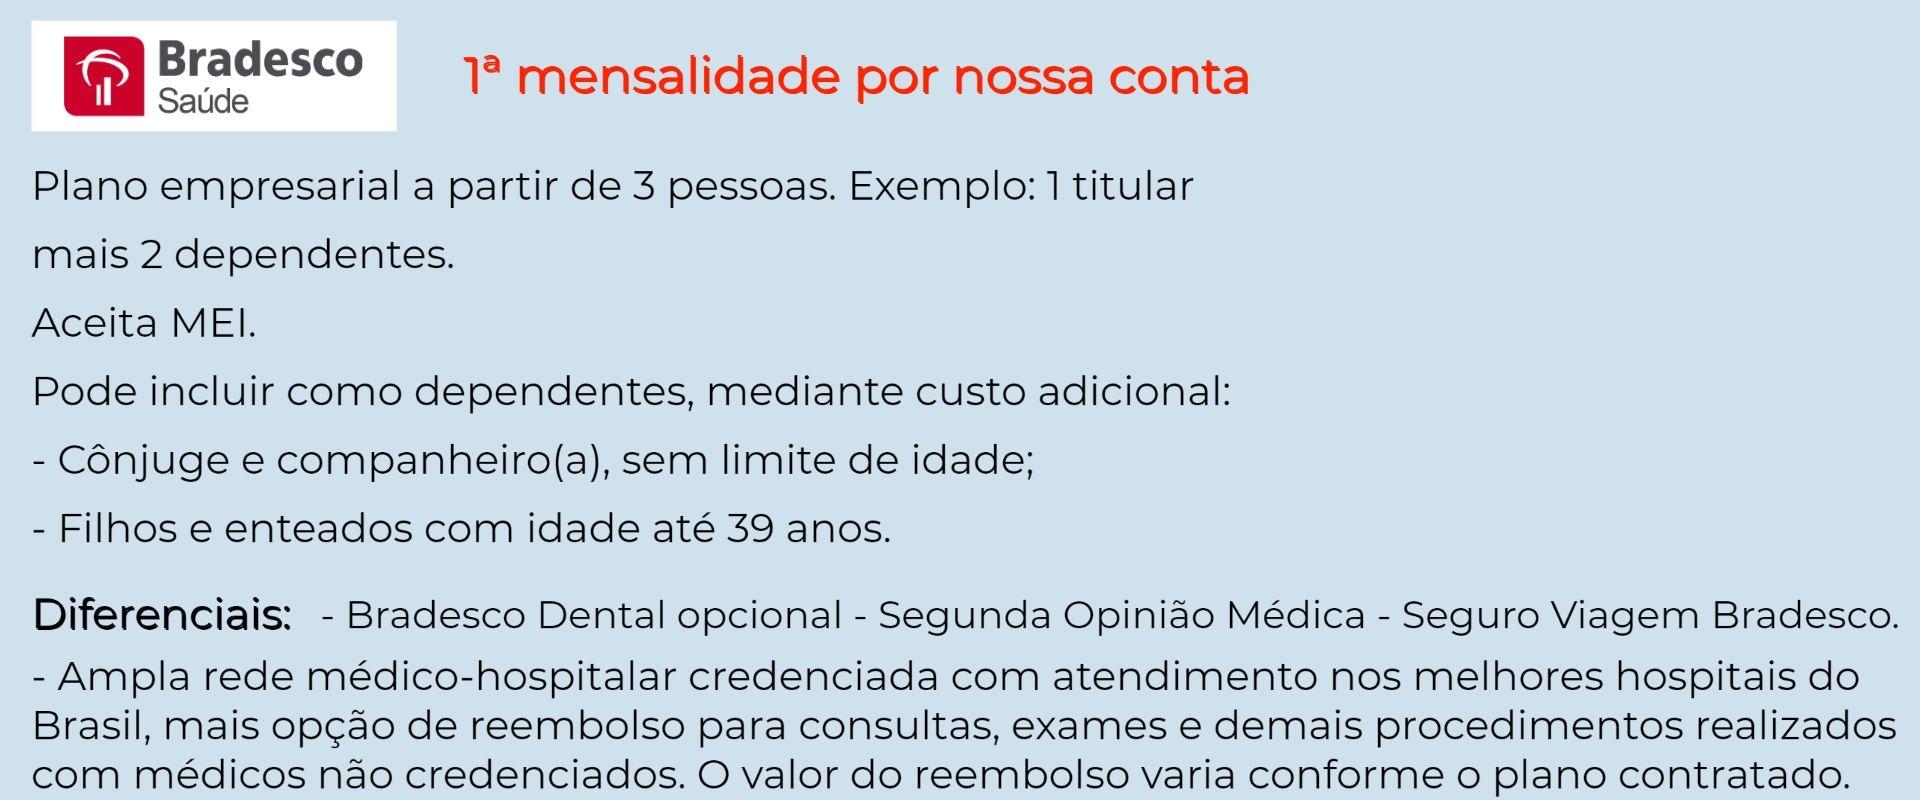 Bradesco Saúde Empresarial - Cabreúva